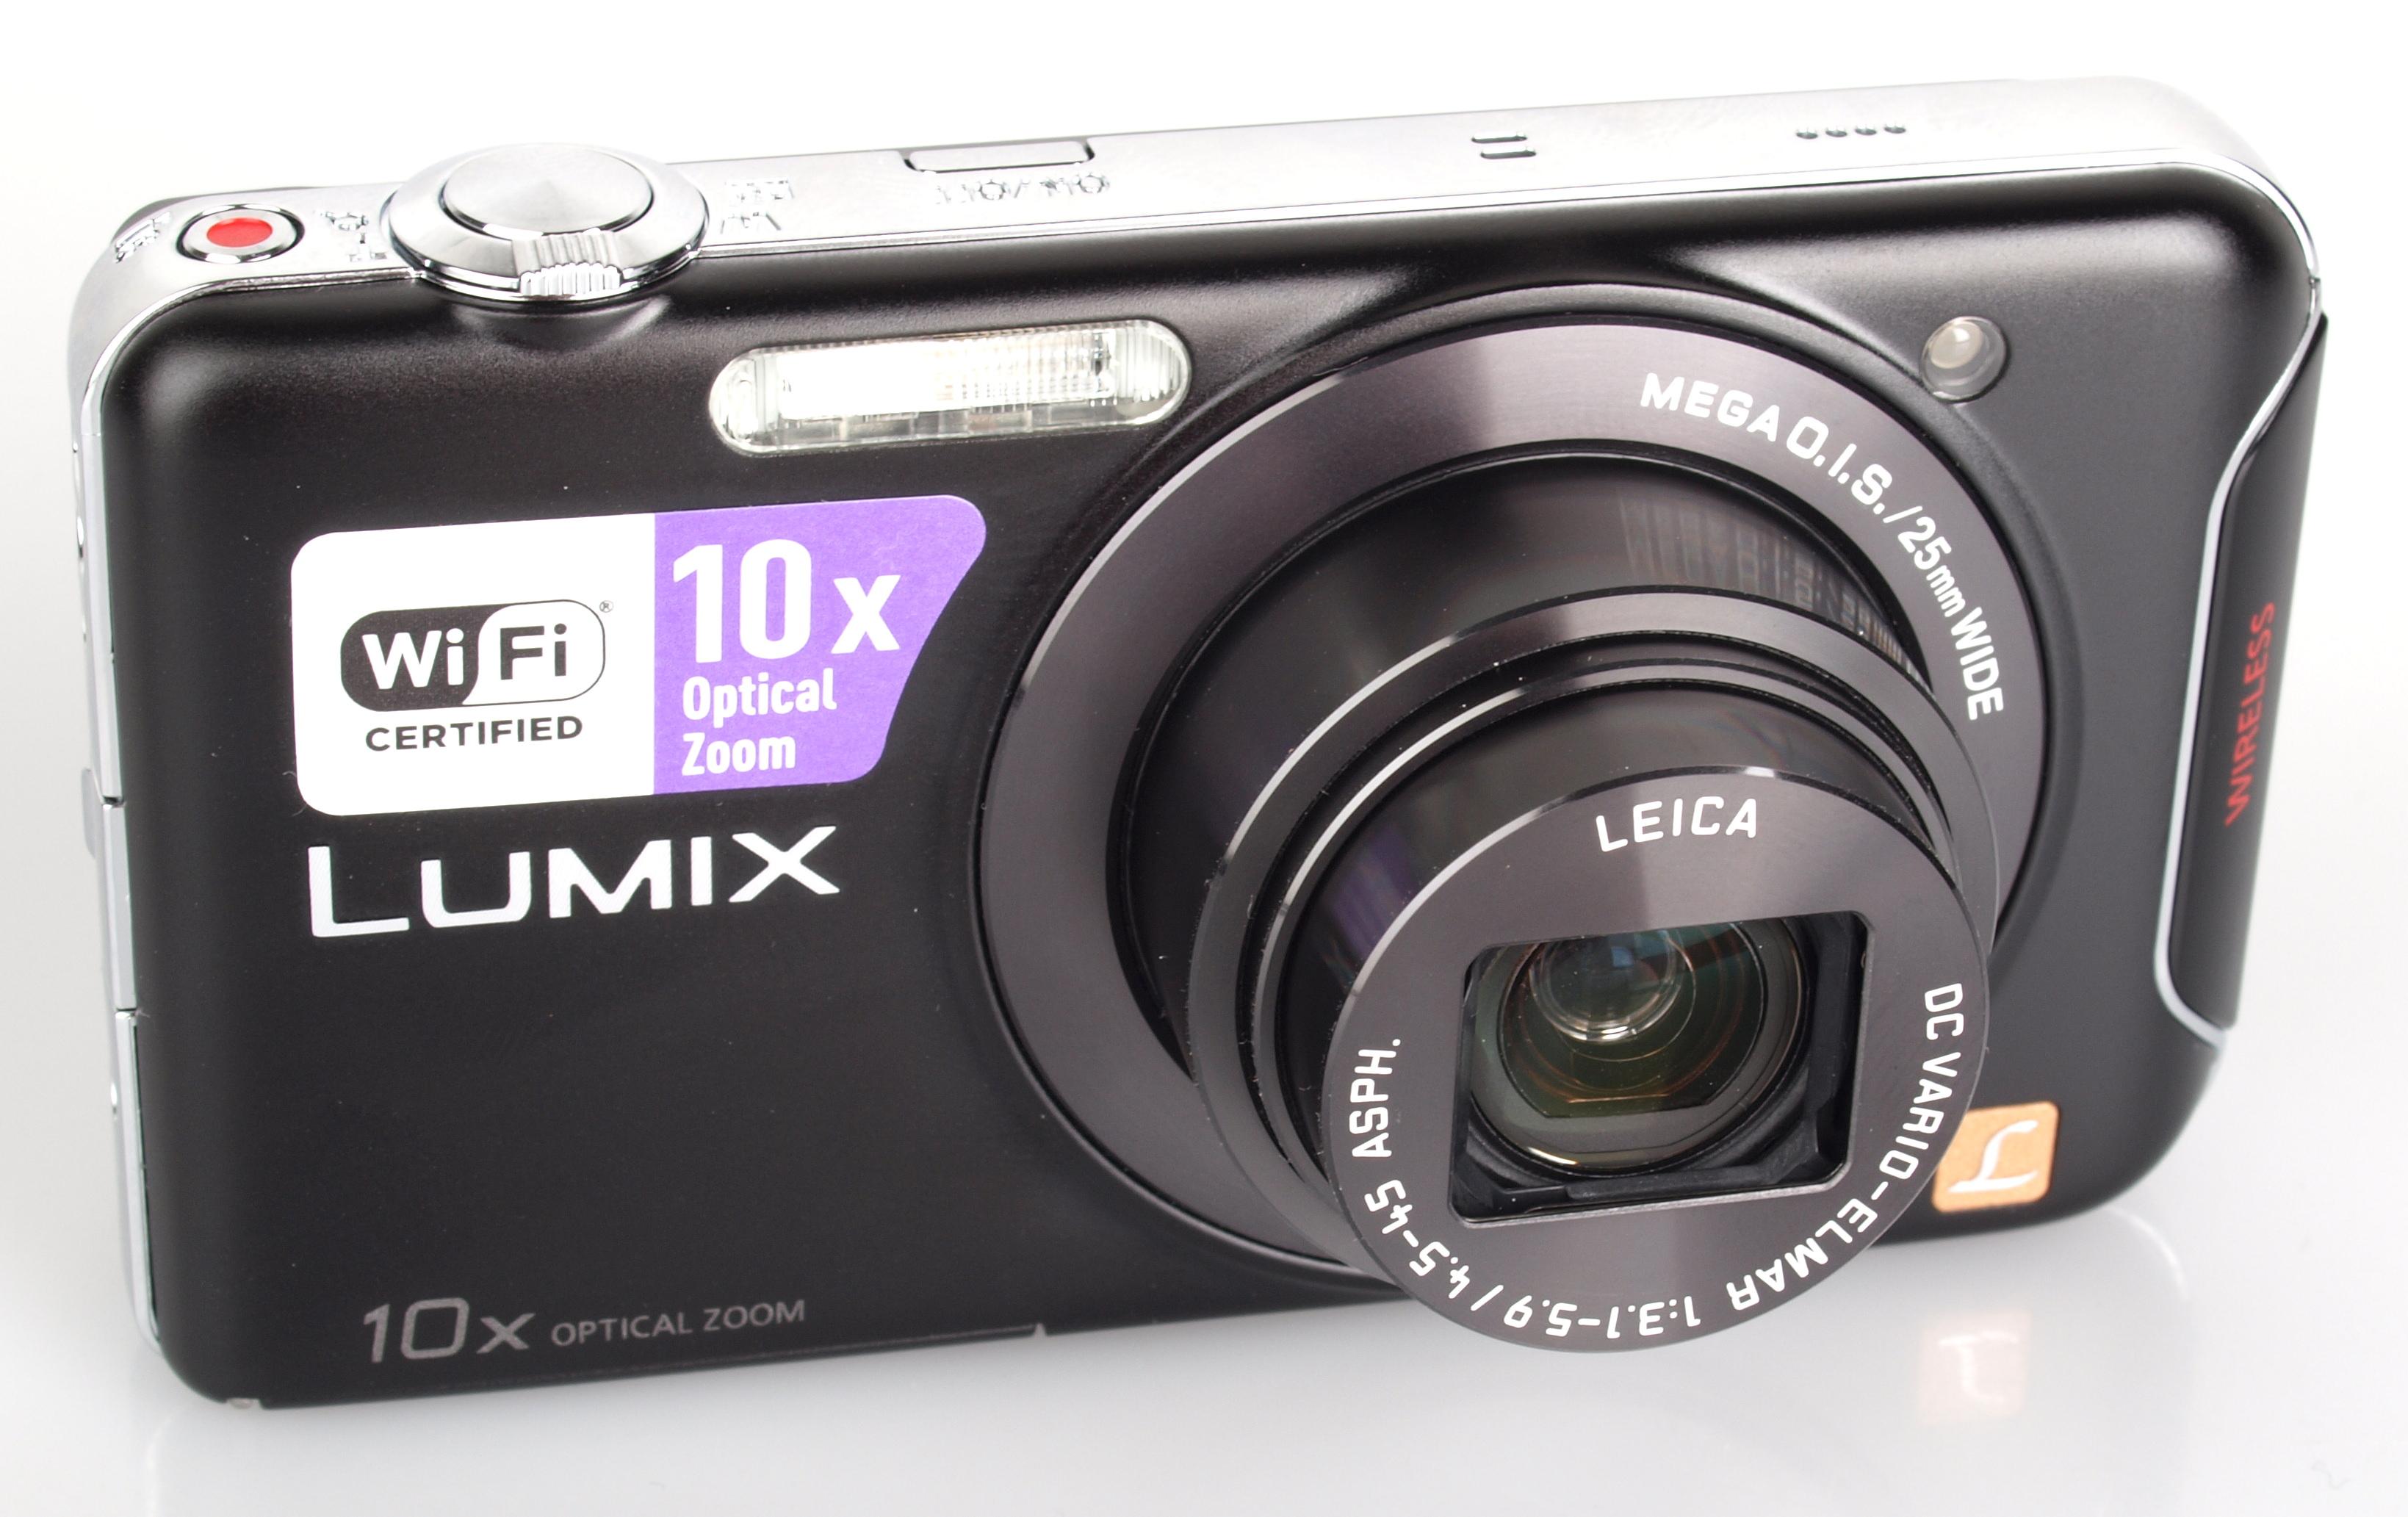 Panasonic Lumix DMC-SZ5 Wireless Camera Review